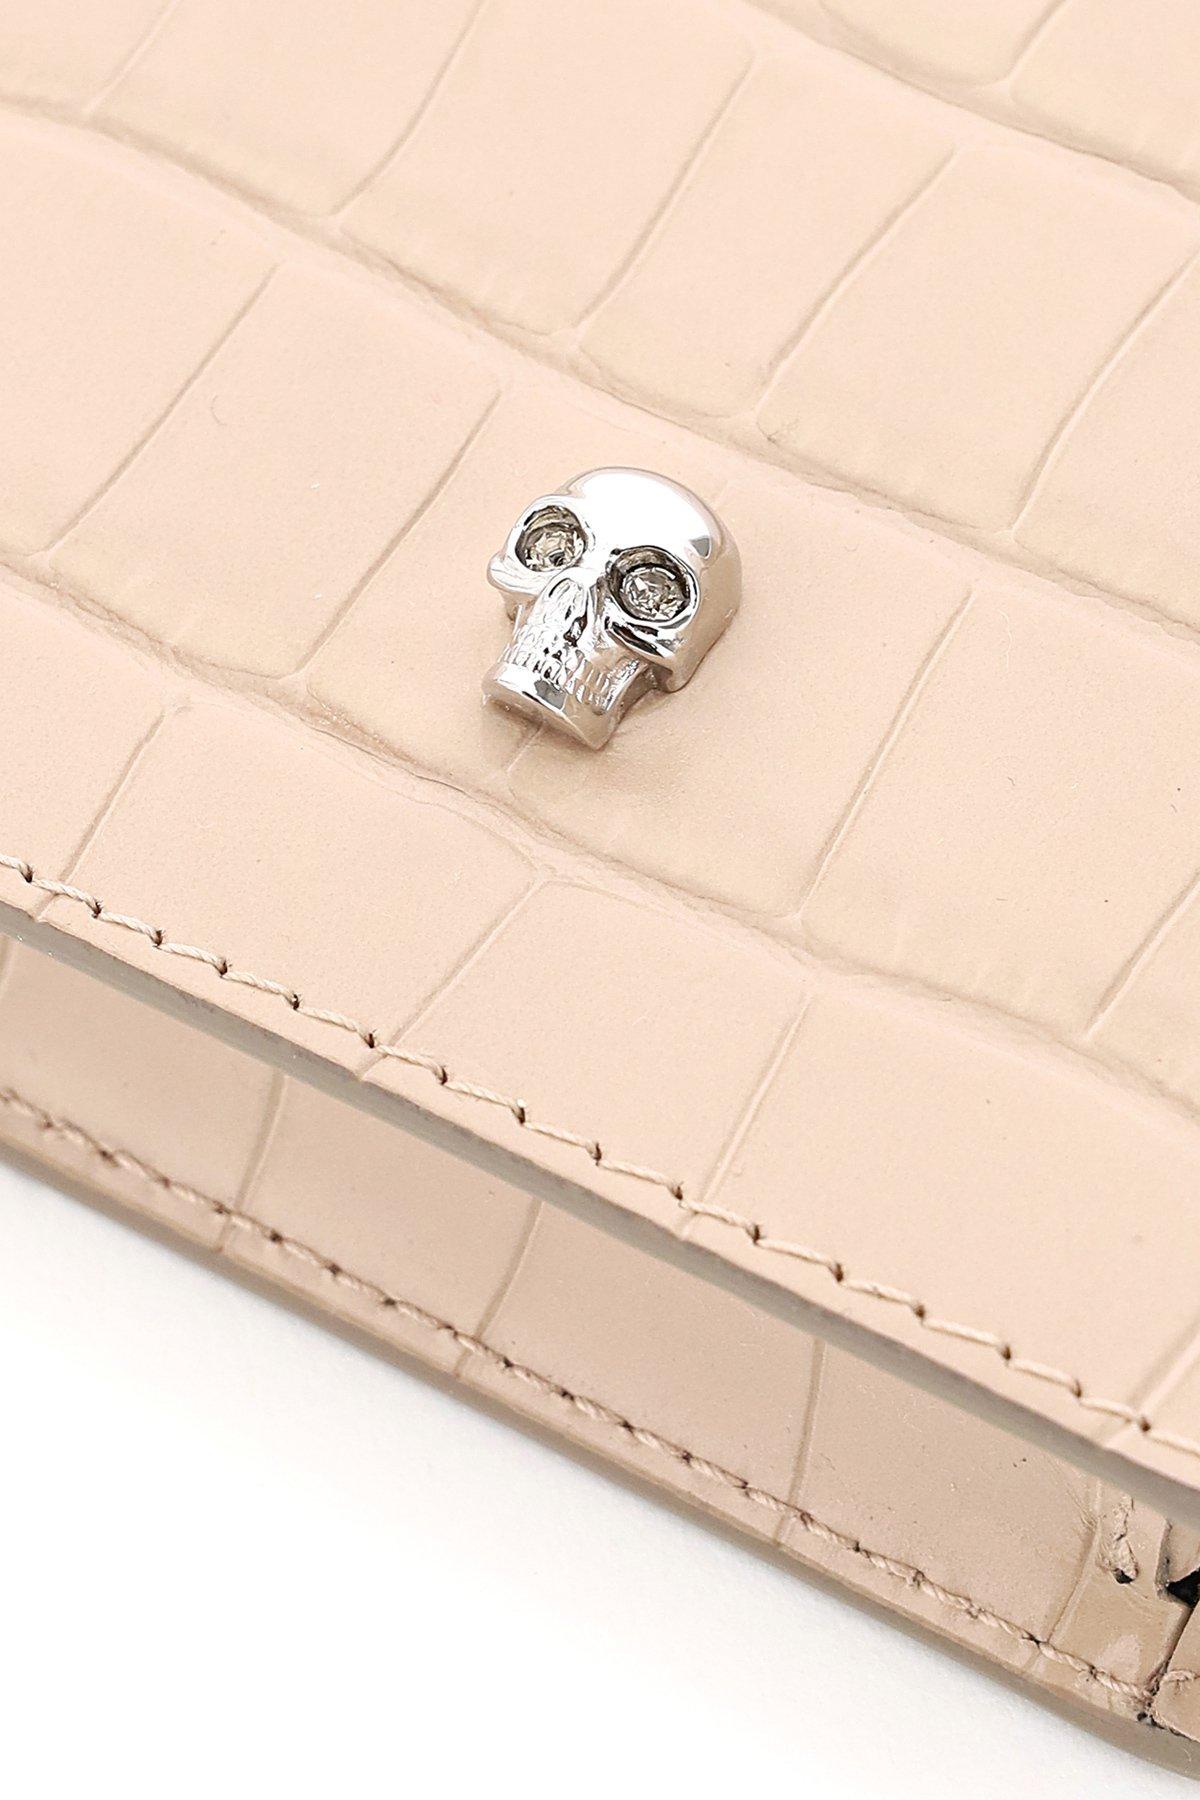 Alexander mcqueen phone case skull chain